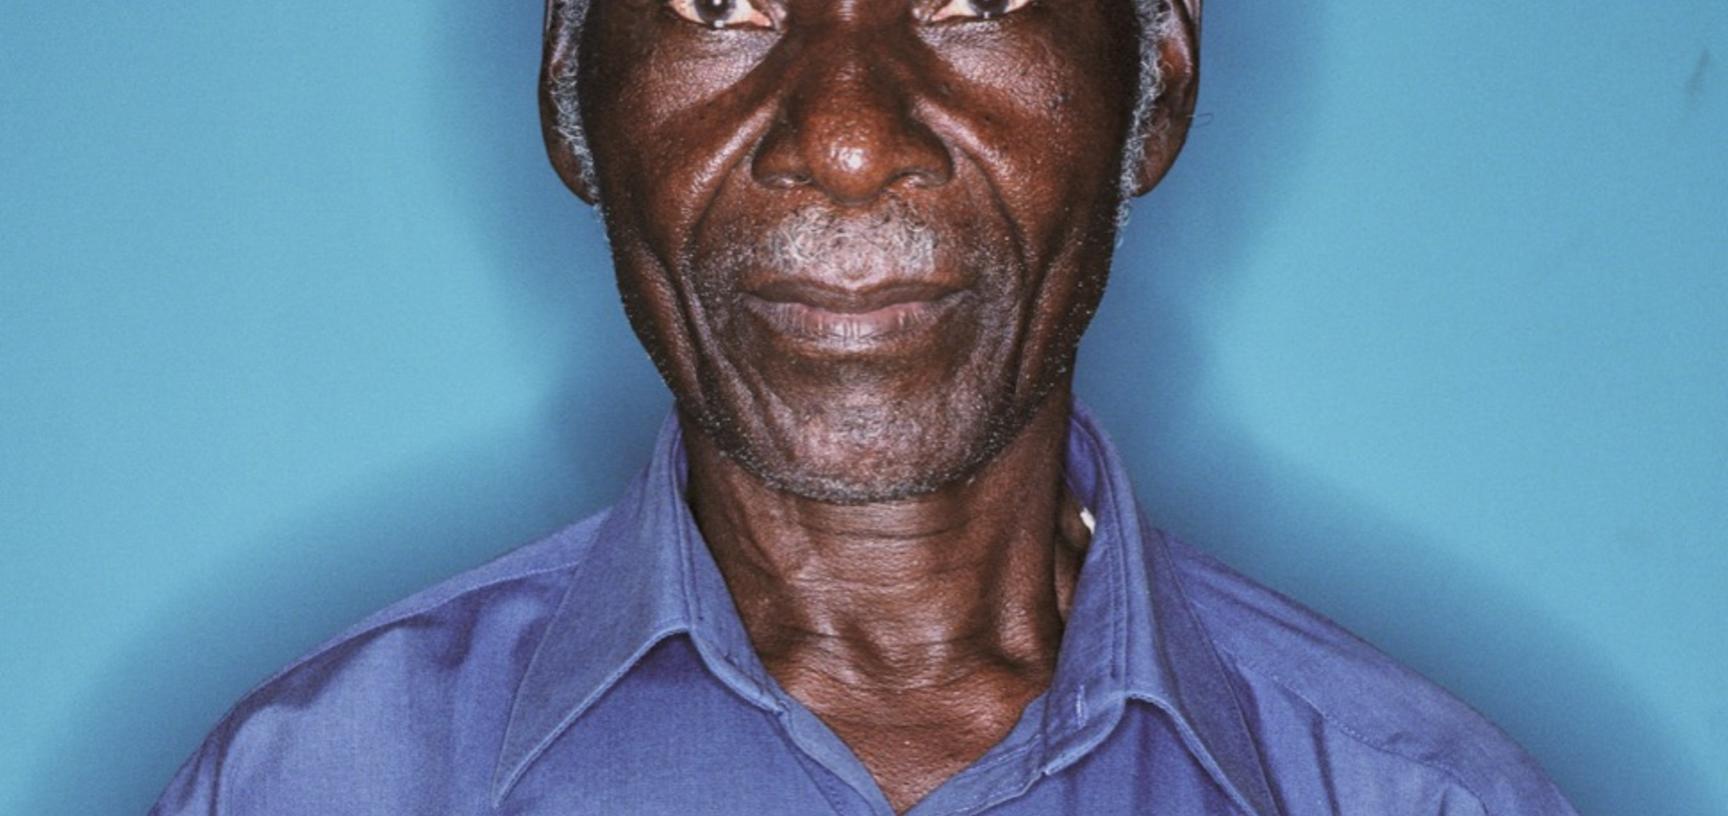 Andrea Stultiens, Arthur C. Kisitu and Kaddu Wasswa (eds.), The Kaddu Wasswa Archive: A Visual Biography (Rotterdam: Post Editions, 2010).